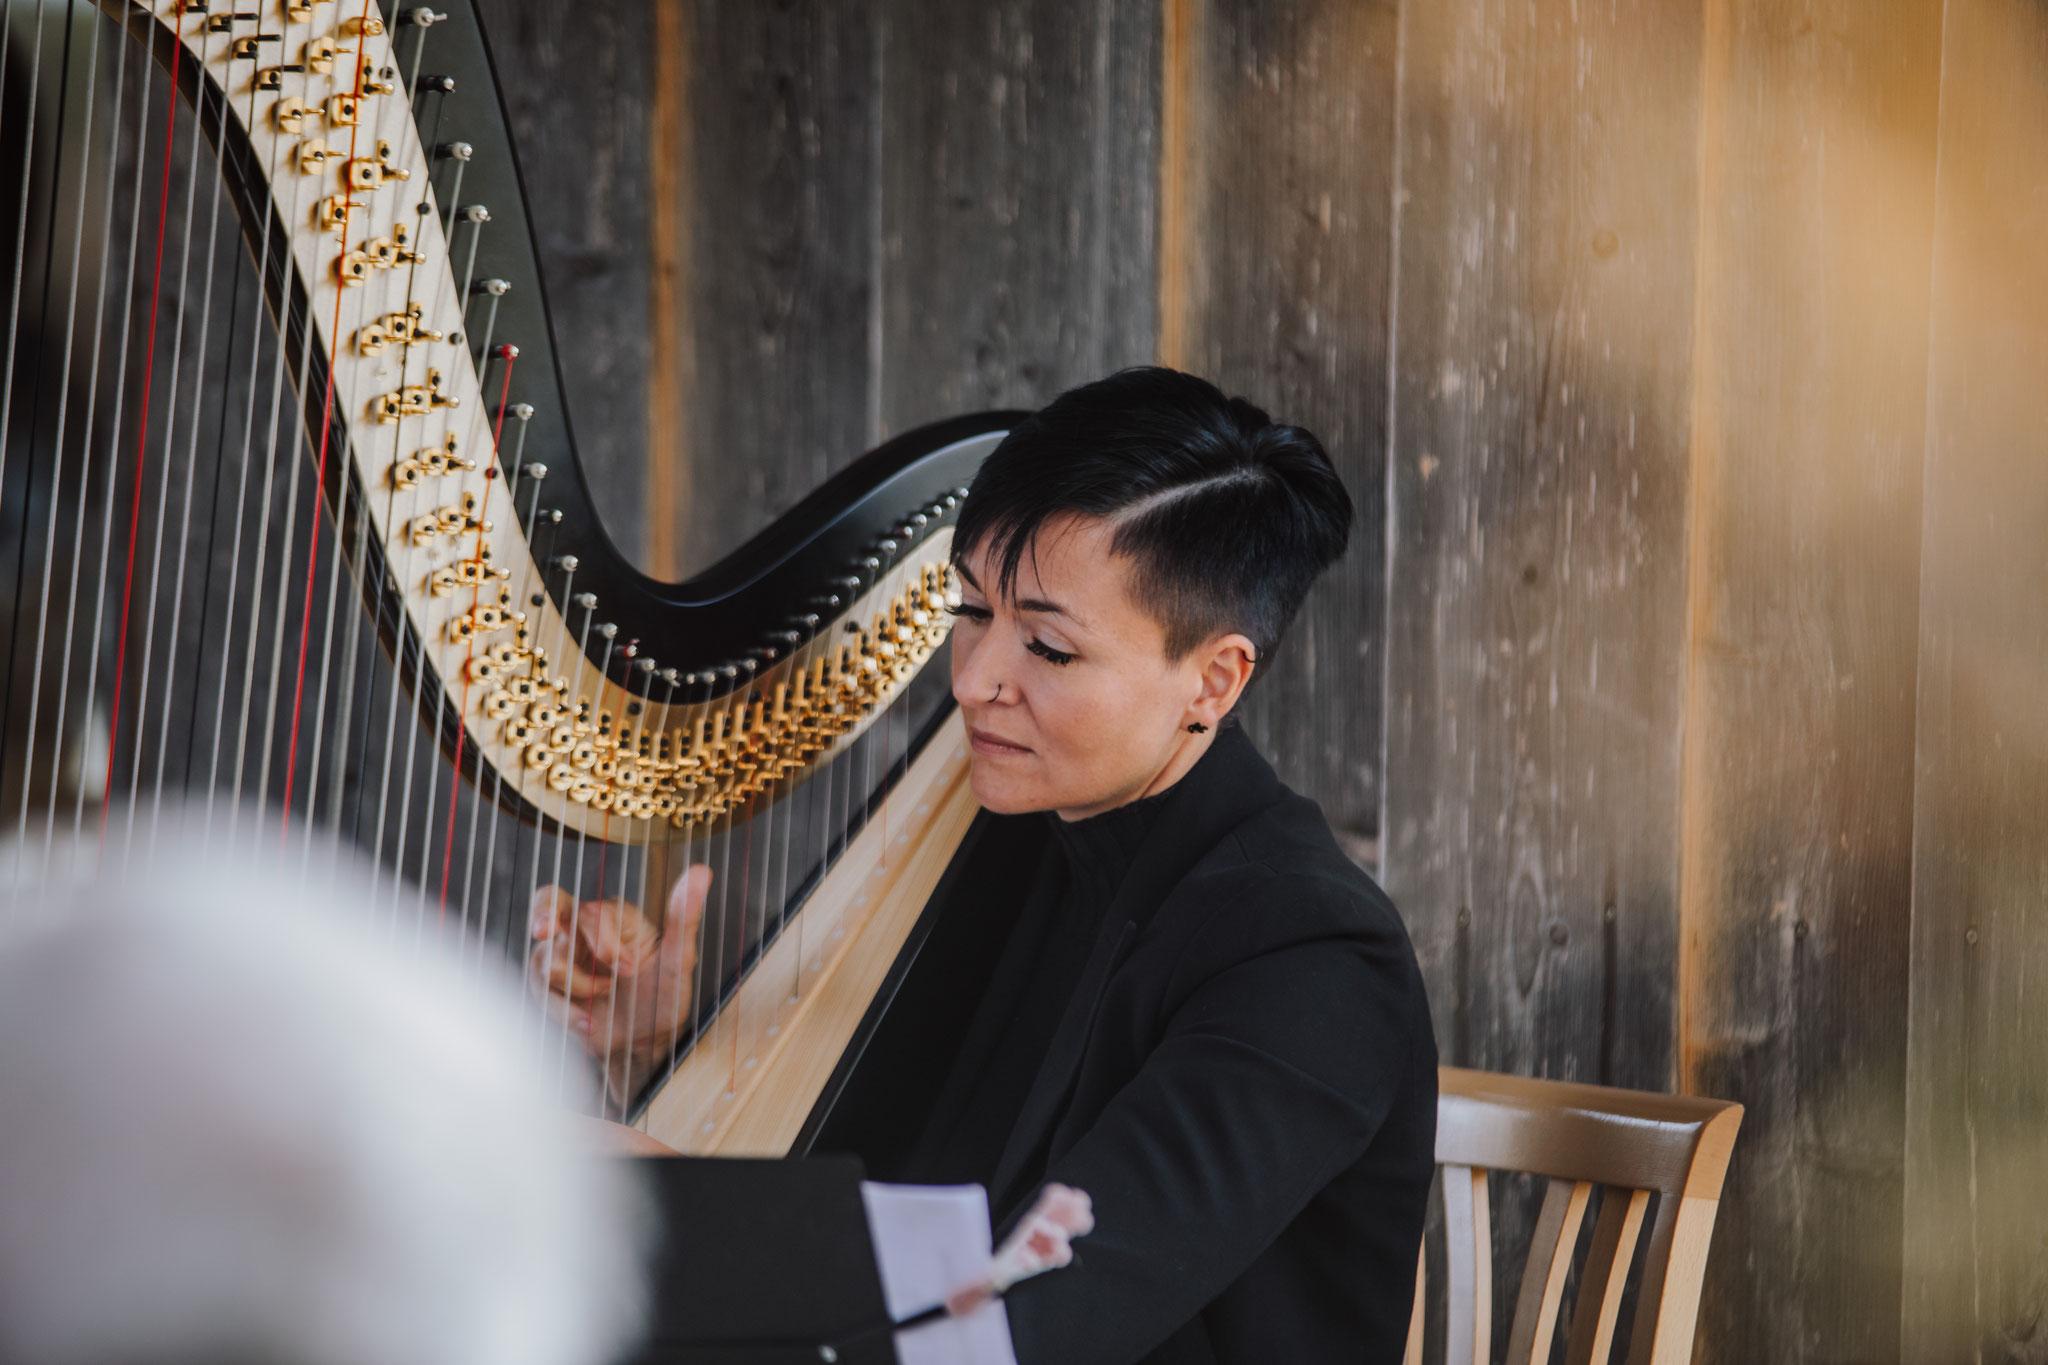 Barbara Regnat - Pilling an der Harfe